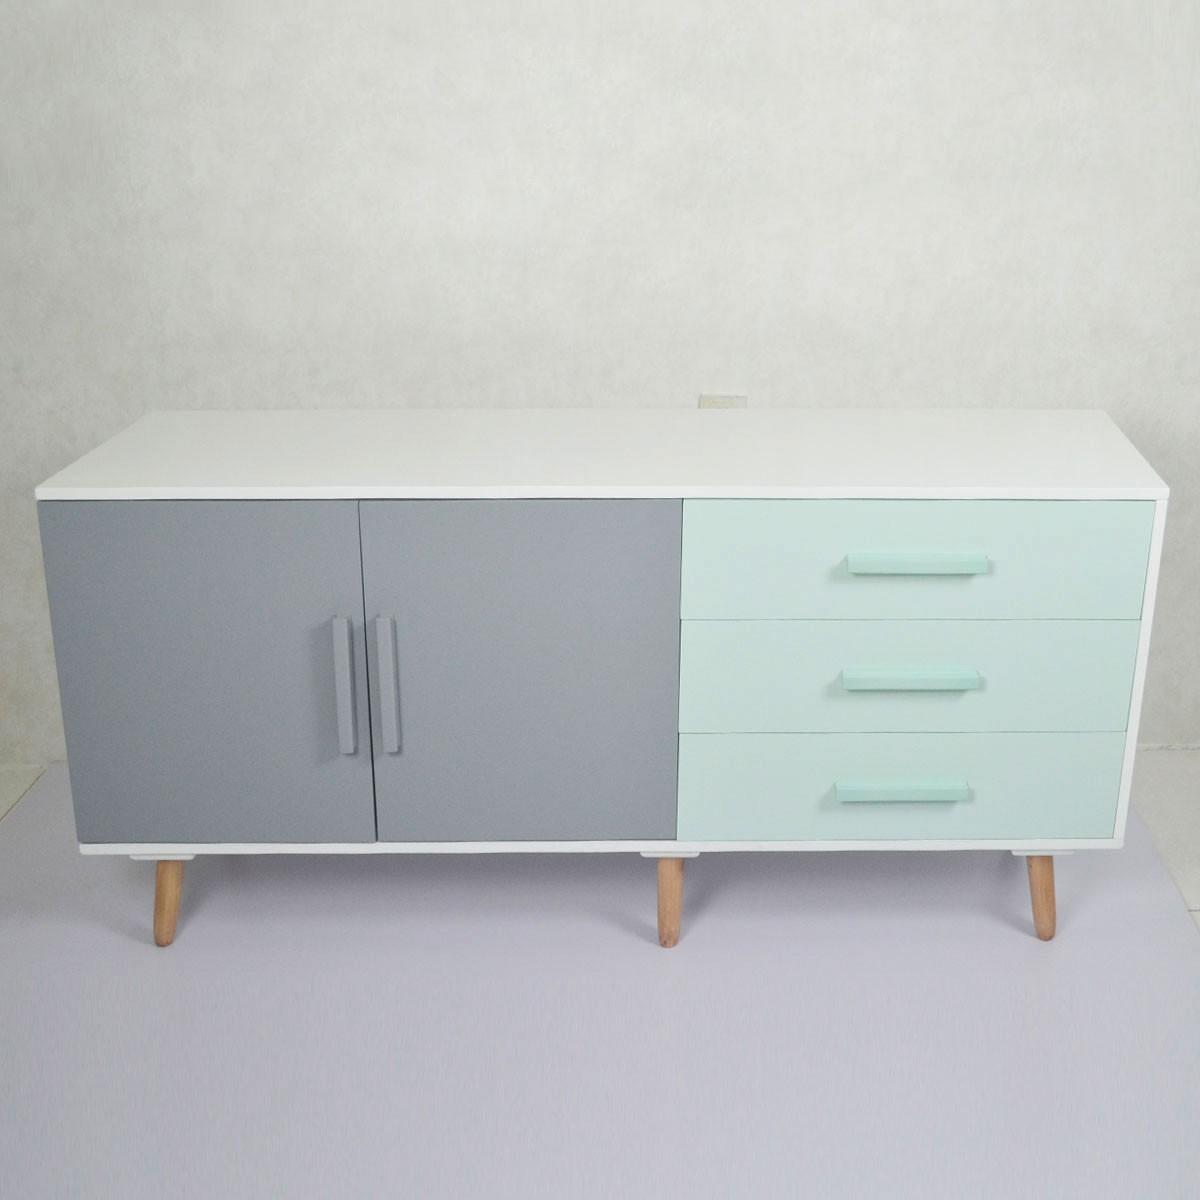 63.0''W Wood TV Stand (JI3277)